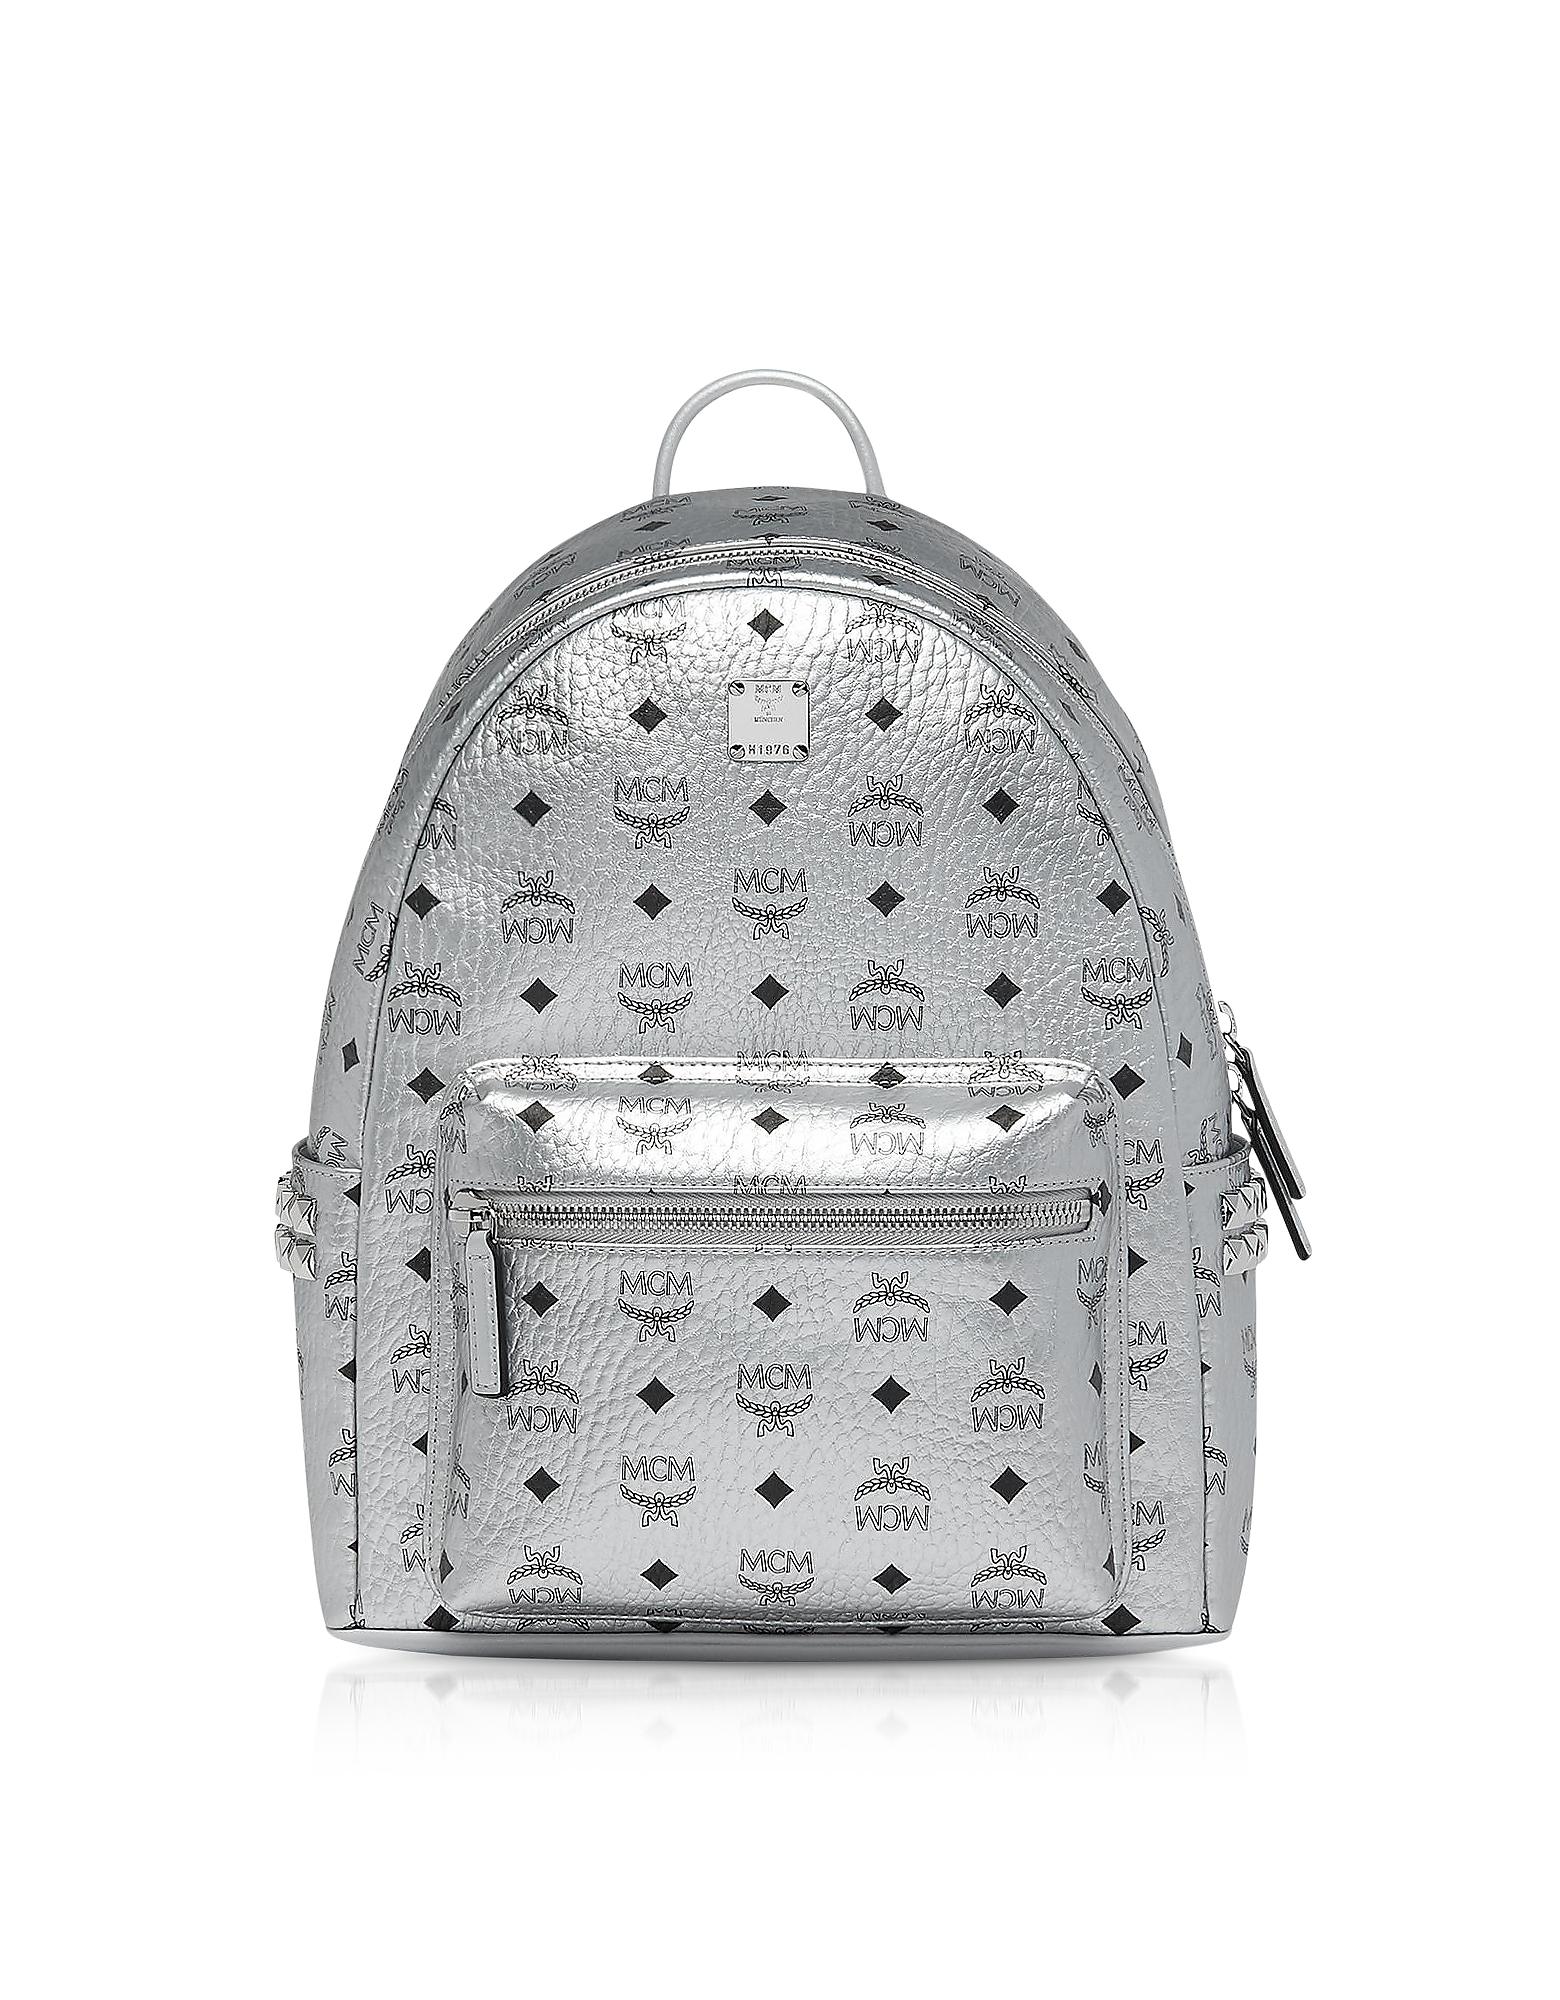 Berlin Silver Side Studs Visetos Stark Backpack 37